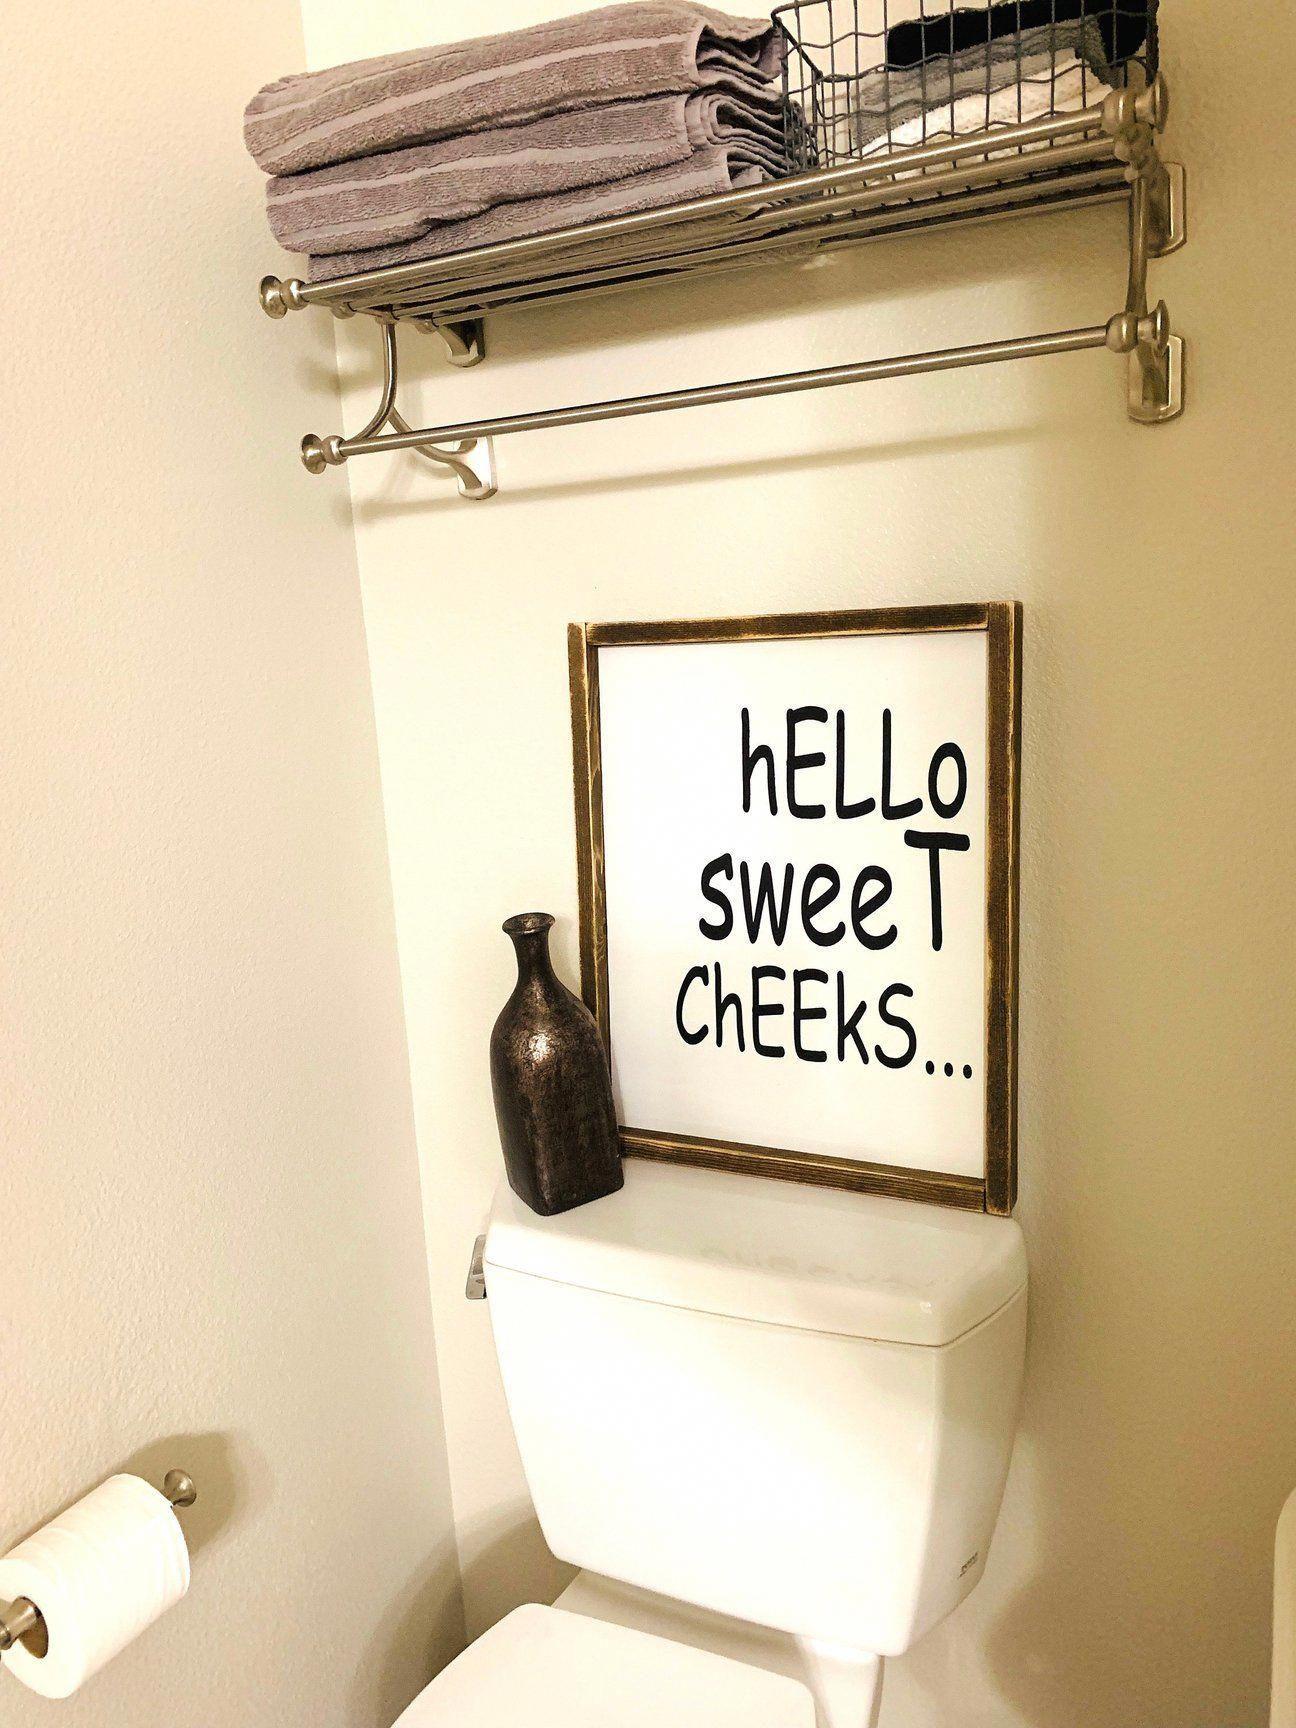 Funny Bathroom Signs, Bathroom Wall Art, Wooden Signs for Restroom